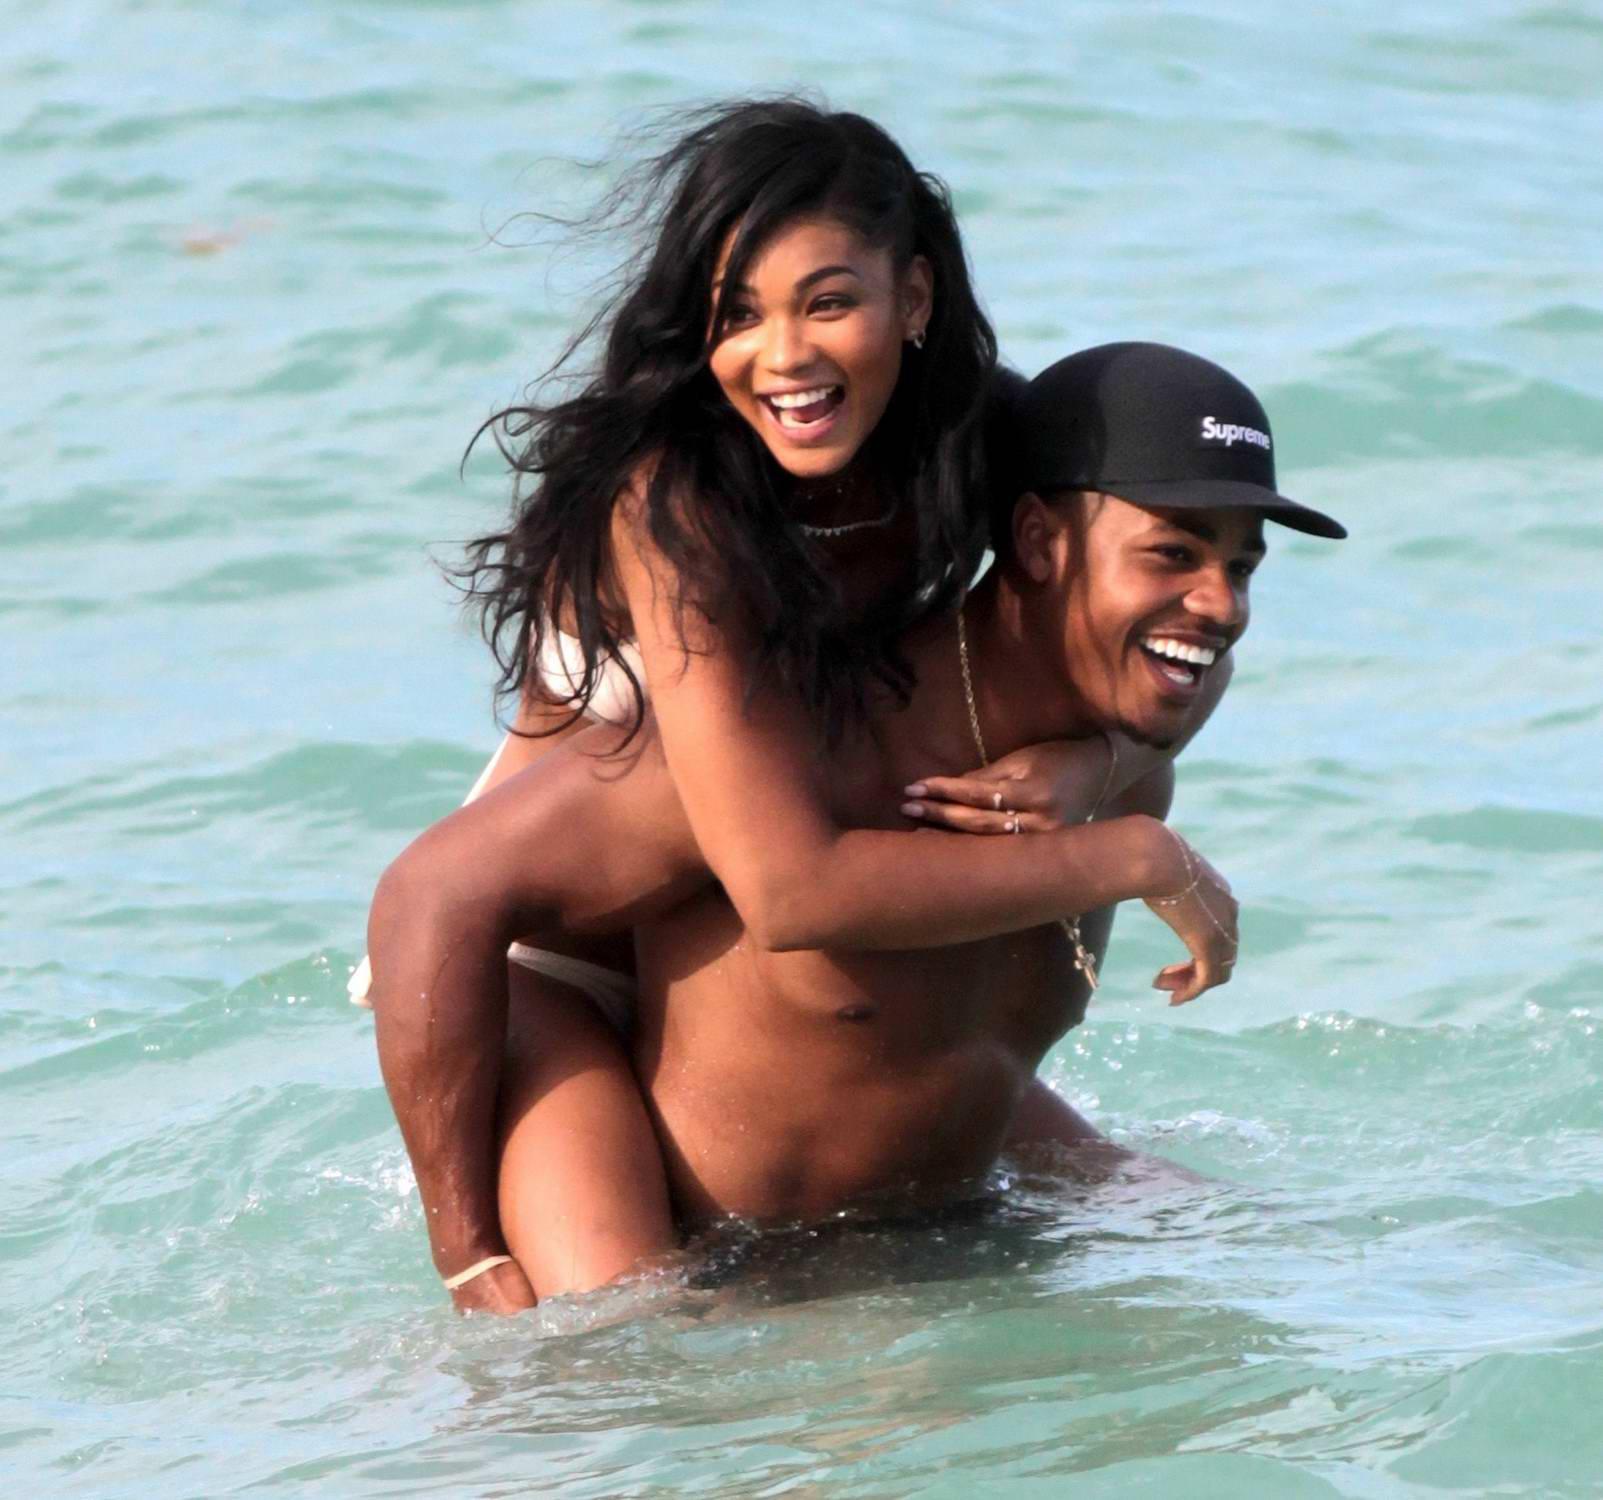 chanel-iman-in-a-bikini-enjoying-a-beach-day-with-her-boyfriend-sterling-shepard-in-miami-300617_5.jpg